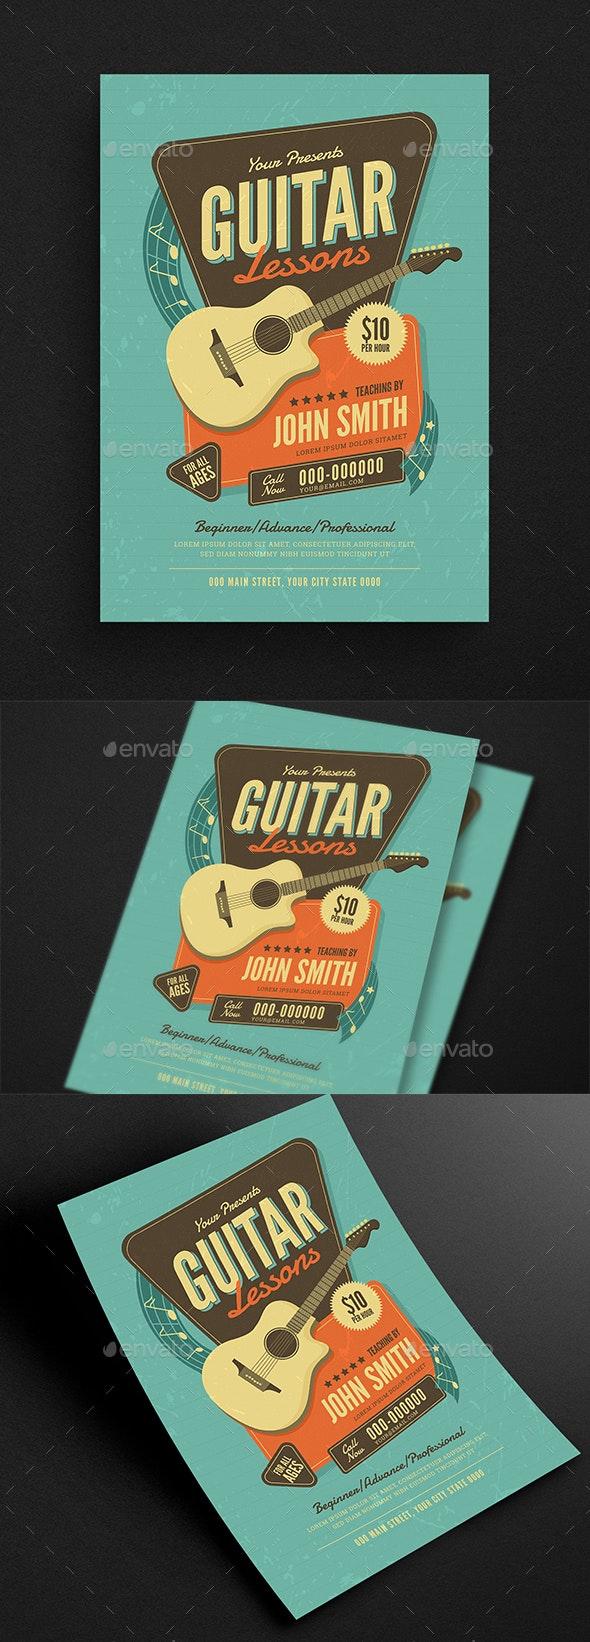 Guitar Lessons Flyer - Flyers Print Templates